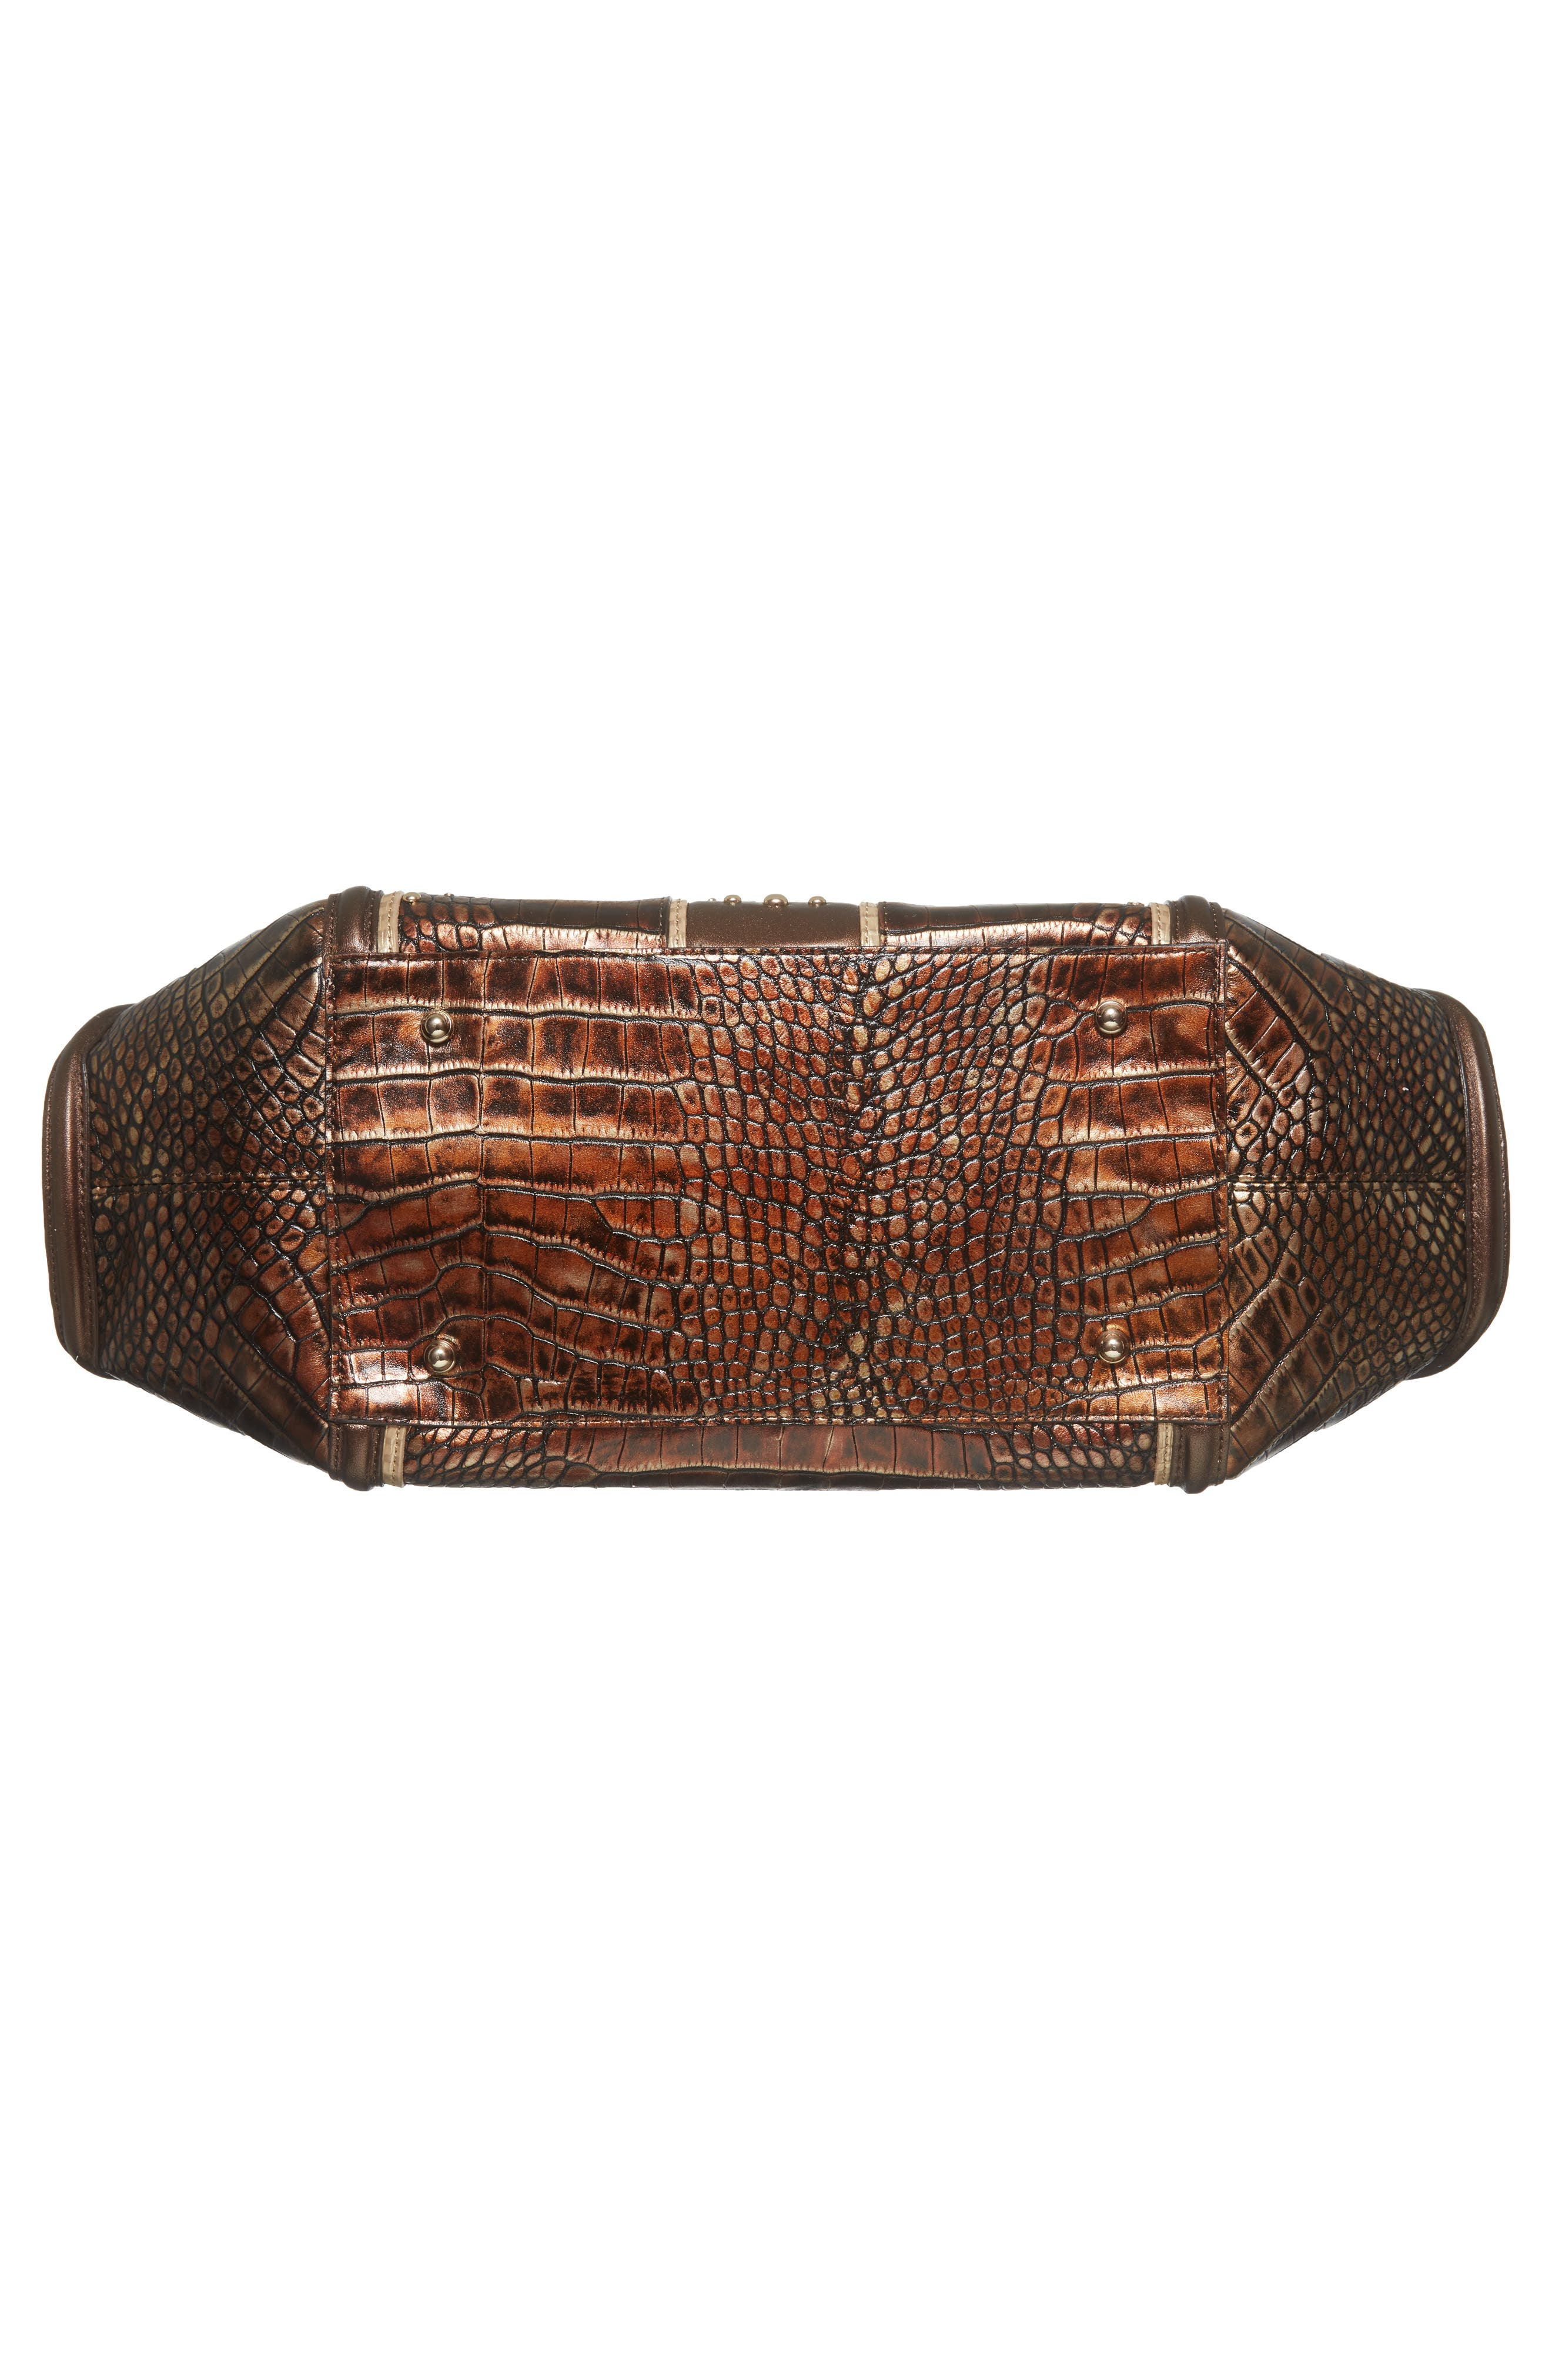 Milan Arden Embossed Leather Satchel,                             Alternate thumbnail 6, color,                             200